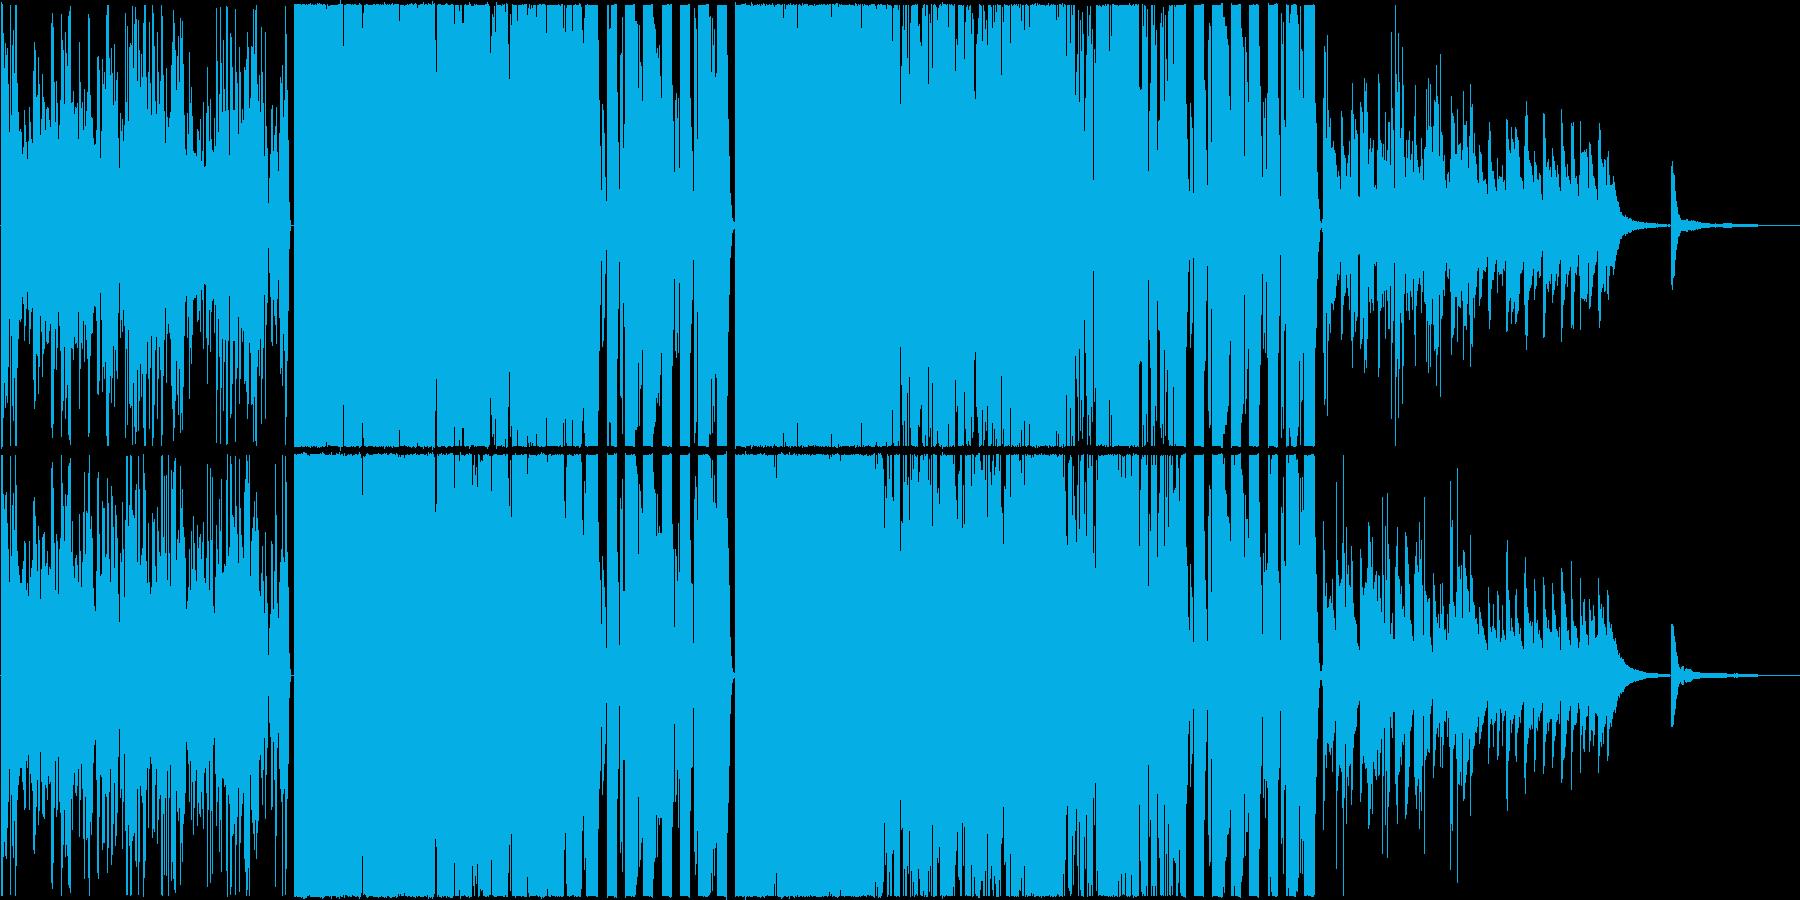 Synth pop kawaiiの再生済みの波形